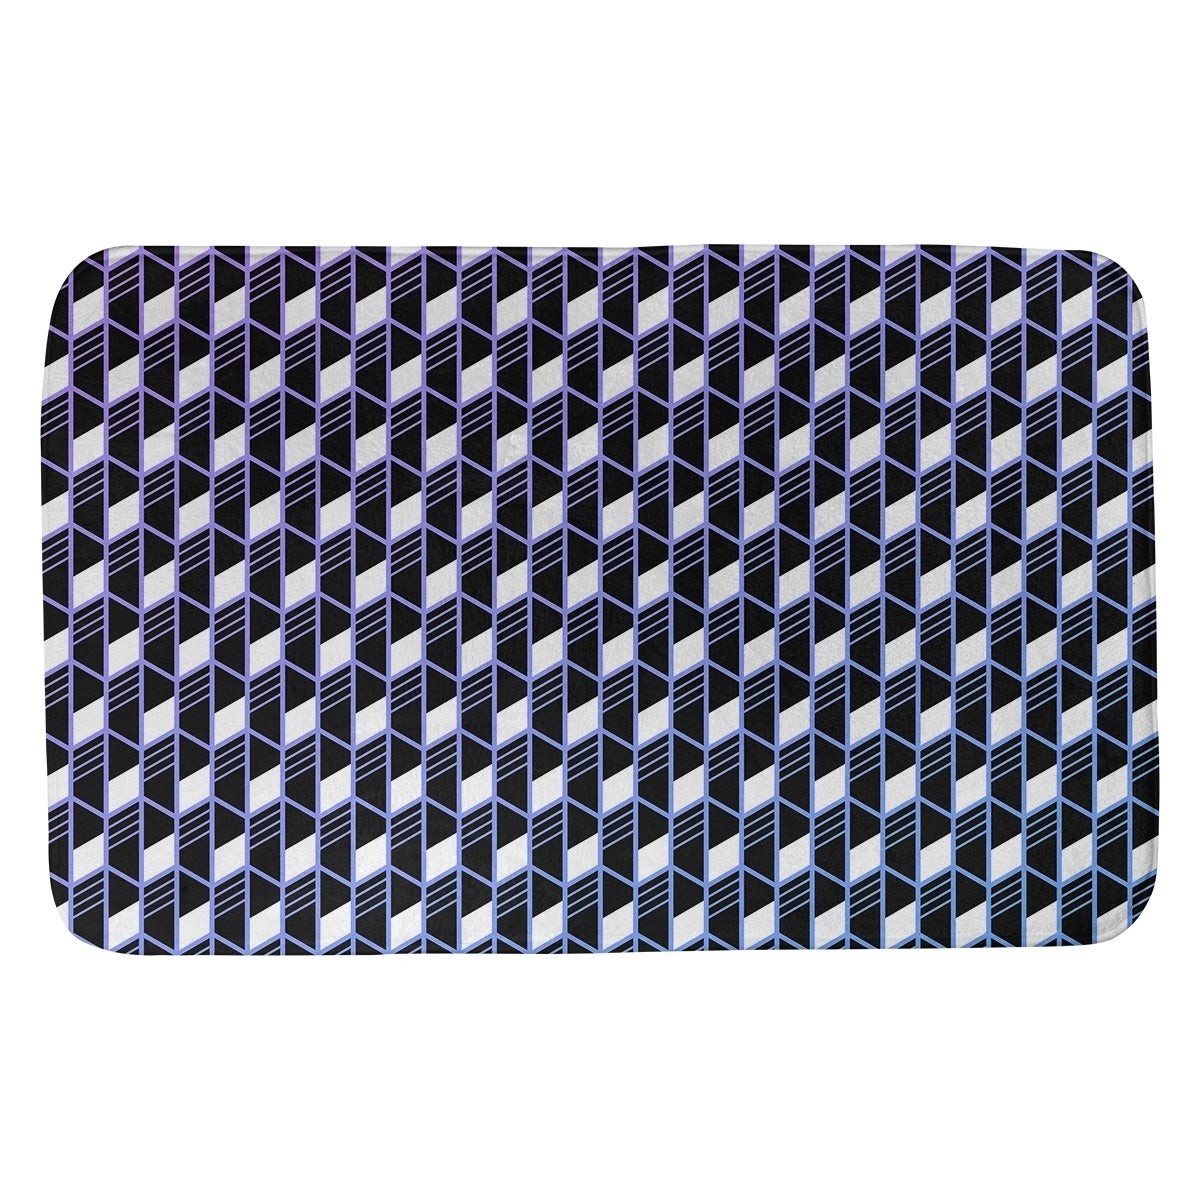 Ombre Geometric Stripes Bath Mat (17 X 24 Blue Green & Pink)